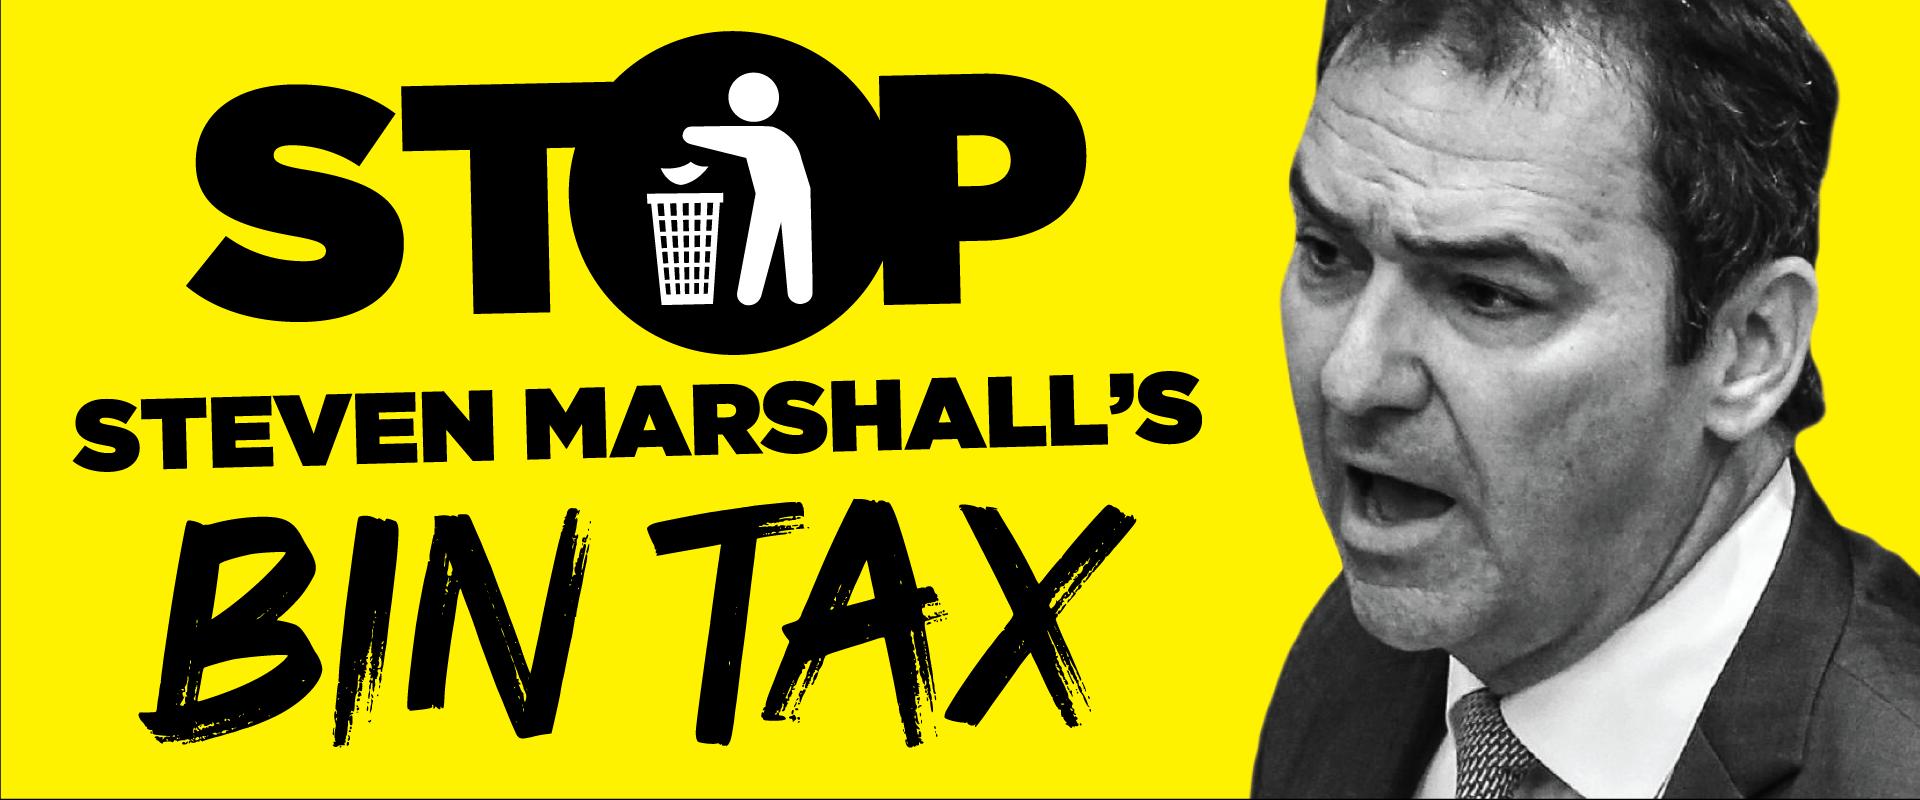 Bin-Tax-Banner (1).png